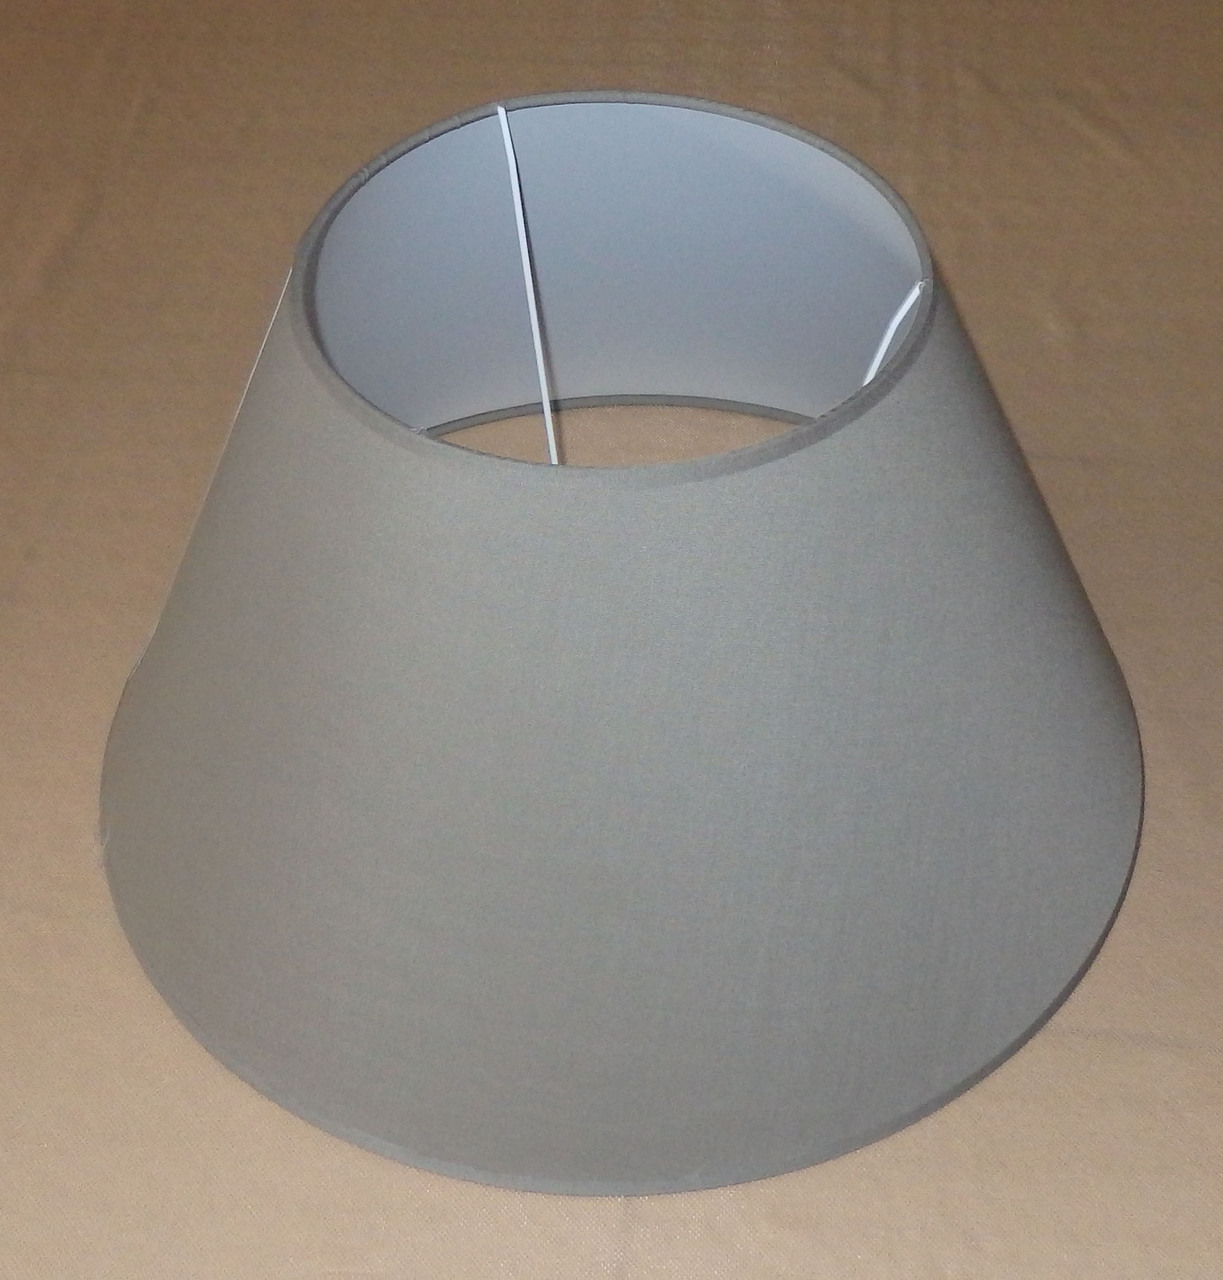 lampenschirm stoff textil stoffschirm a324w1 ca 40 cm. Black Bedroom Furniture Sets. Home Design Ideas